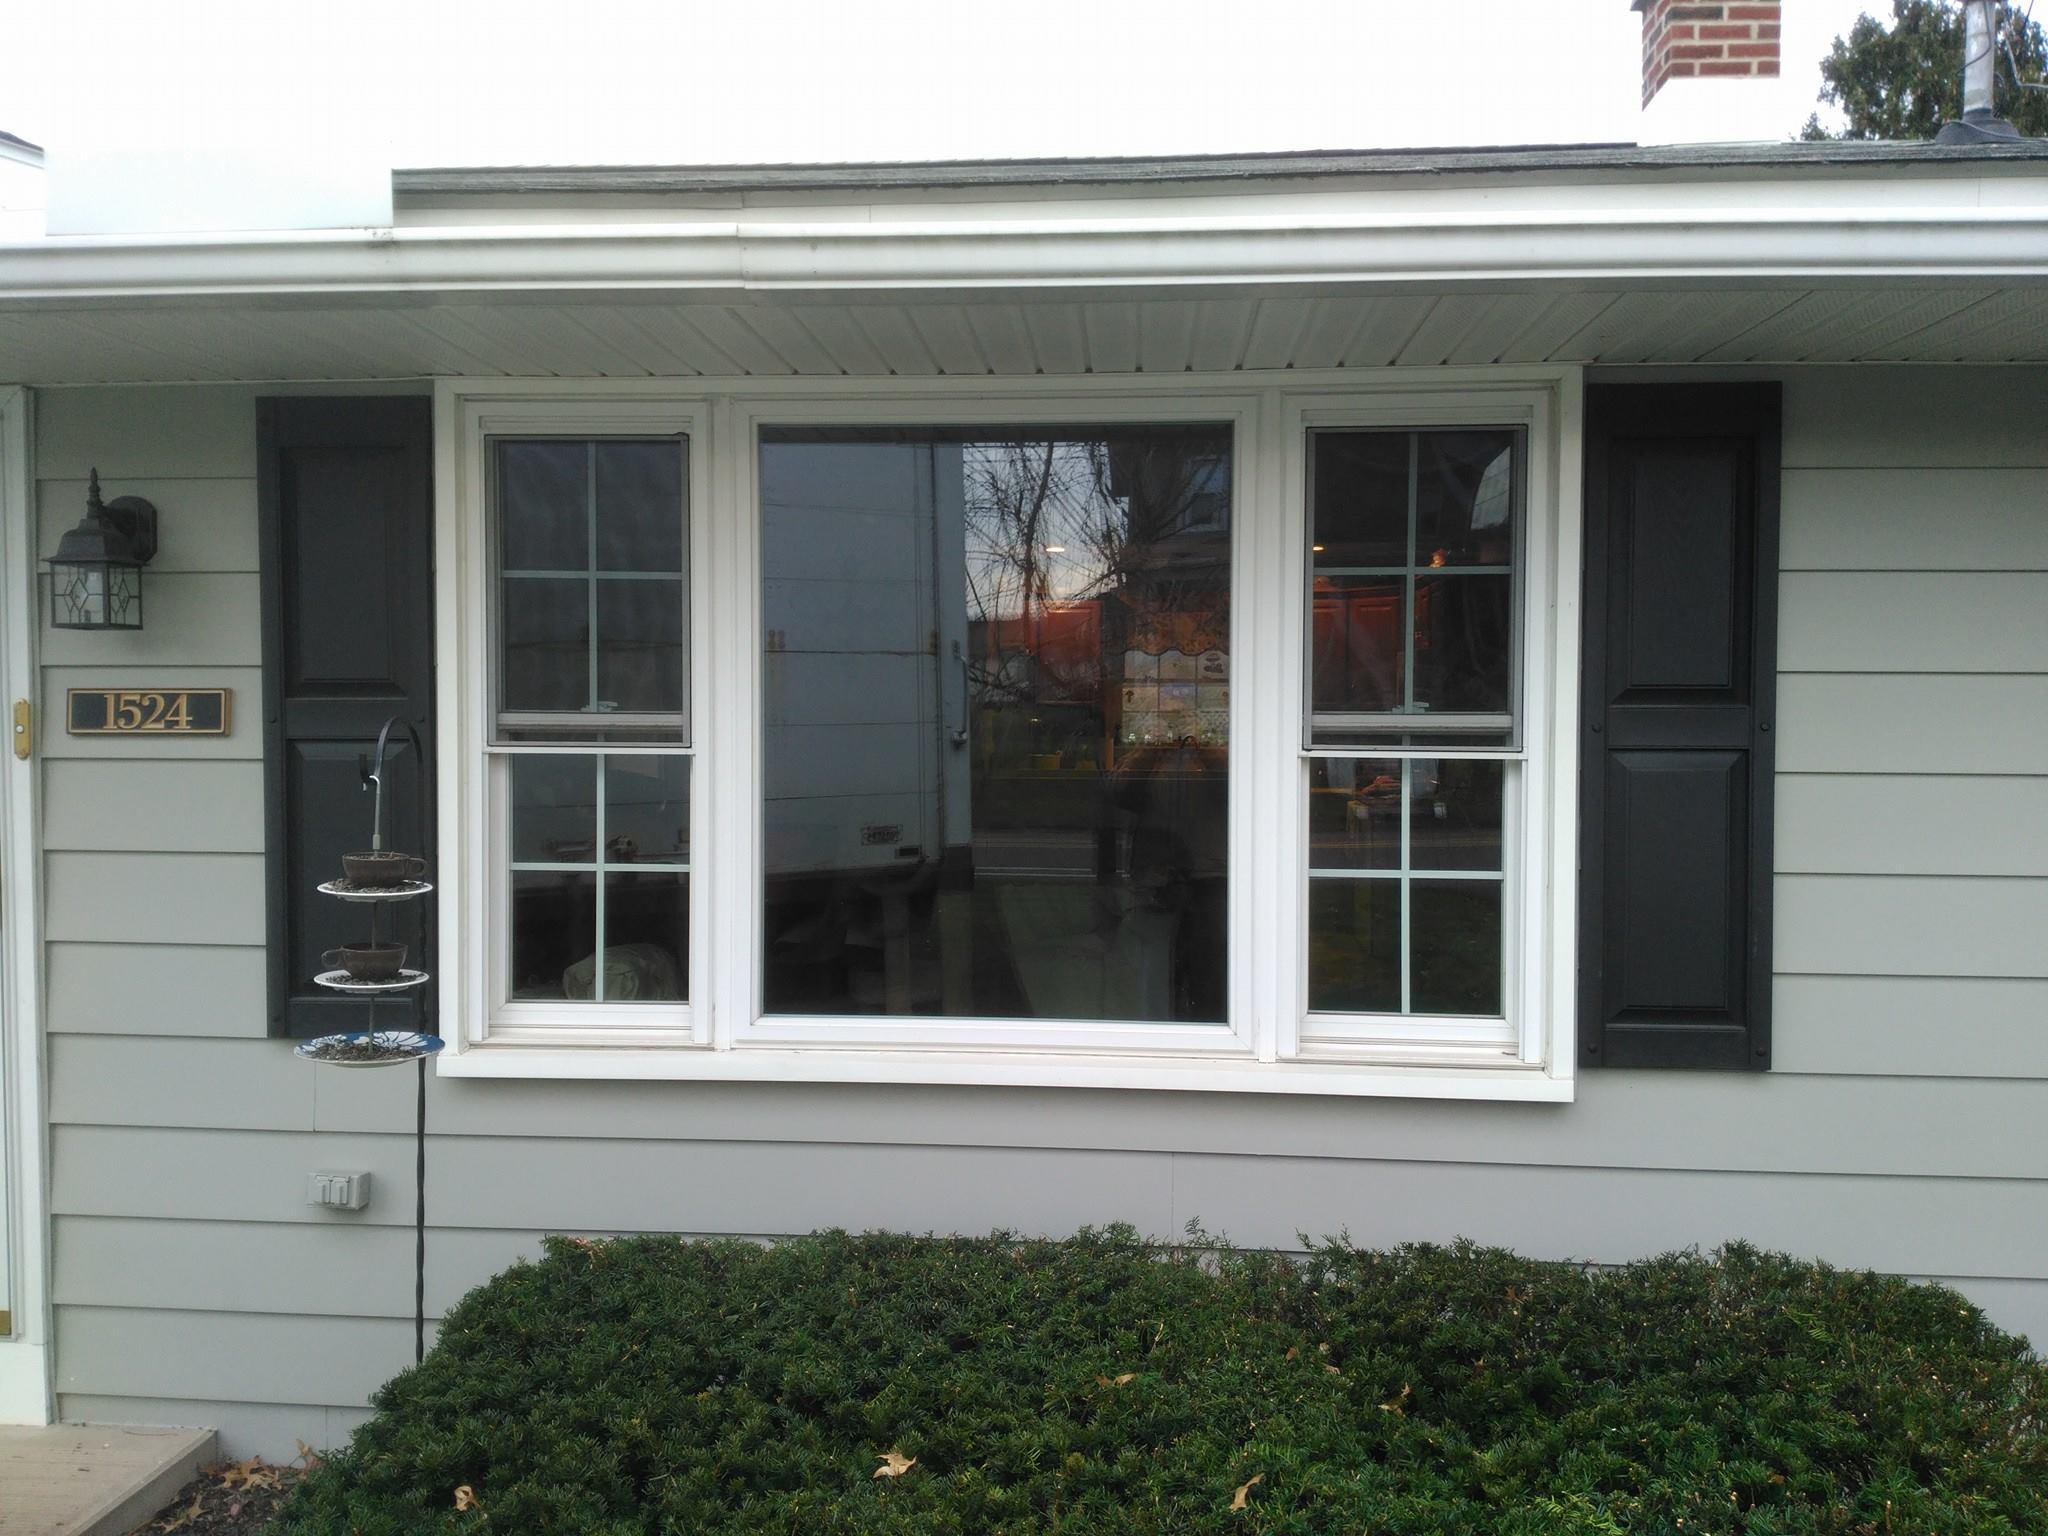 Wengert's Home Center Inc image 0